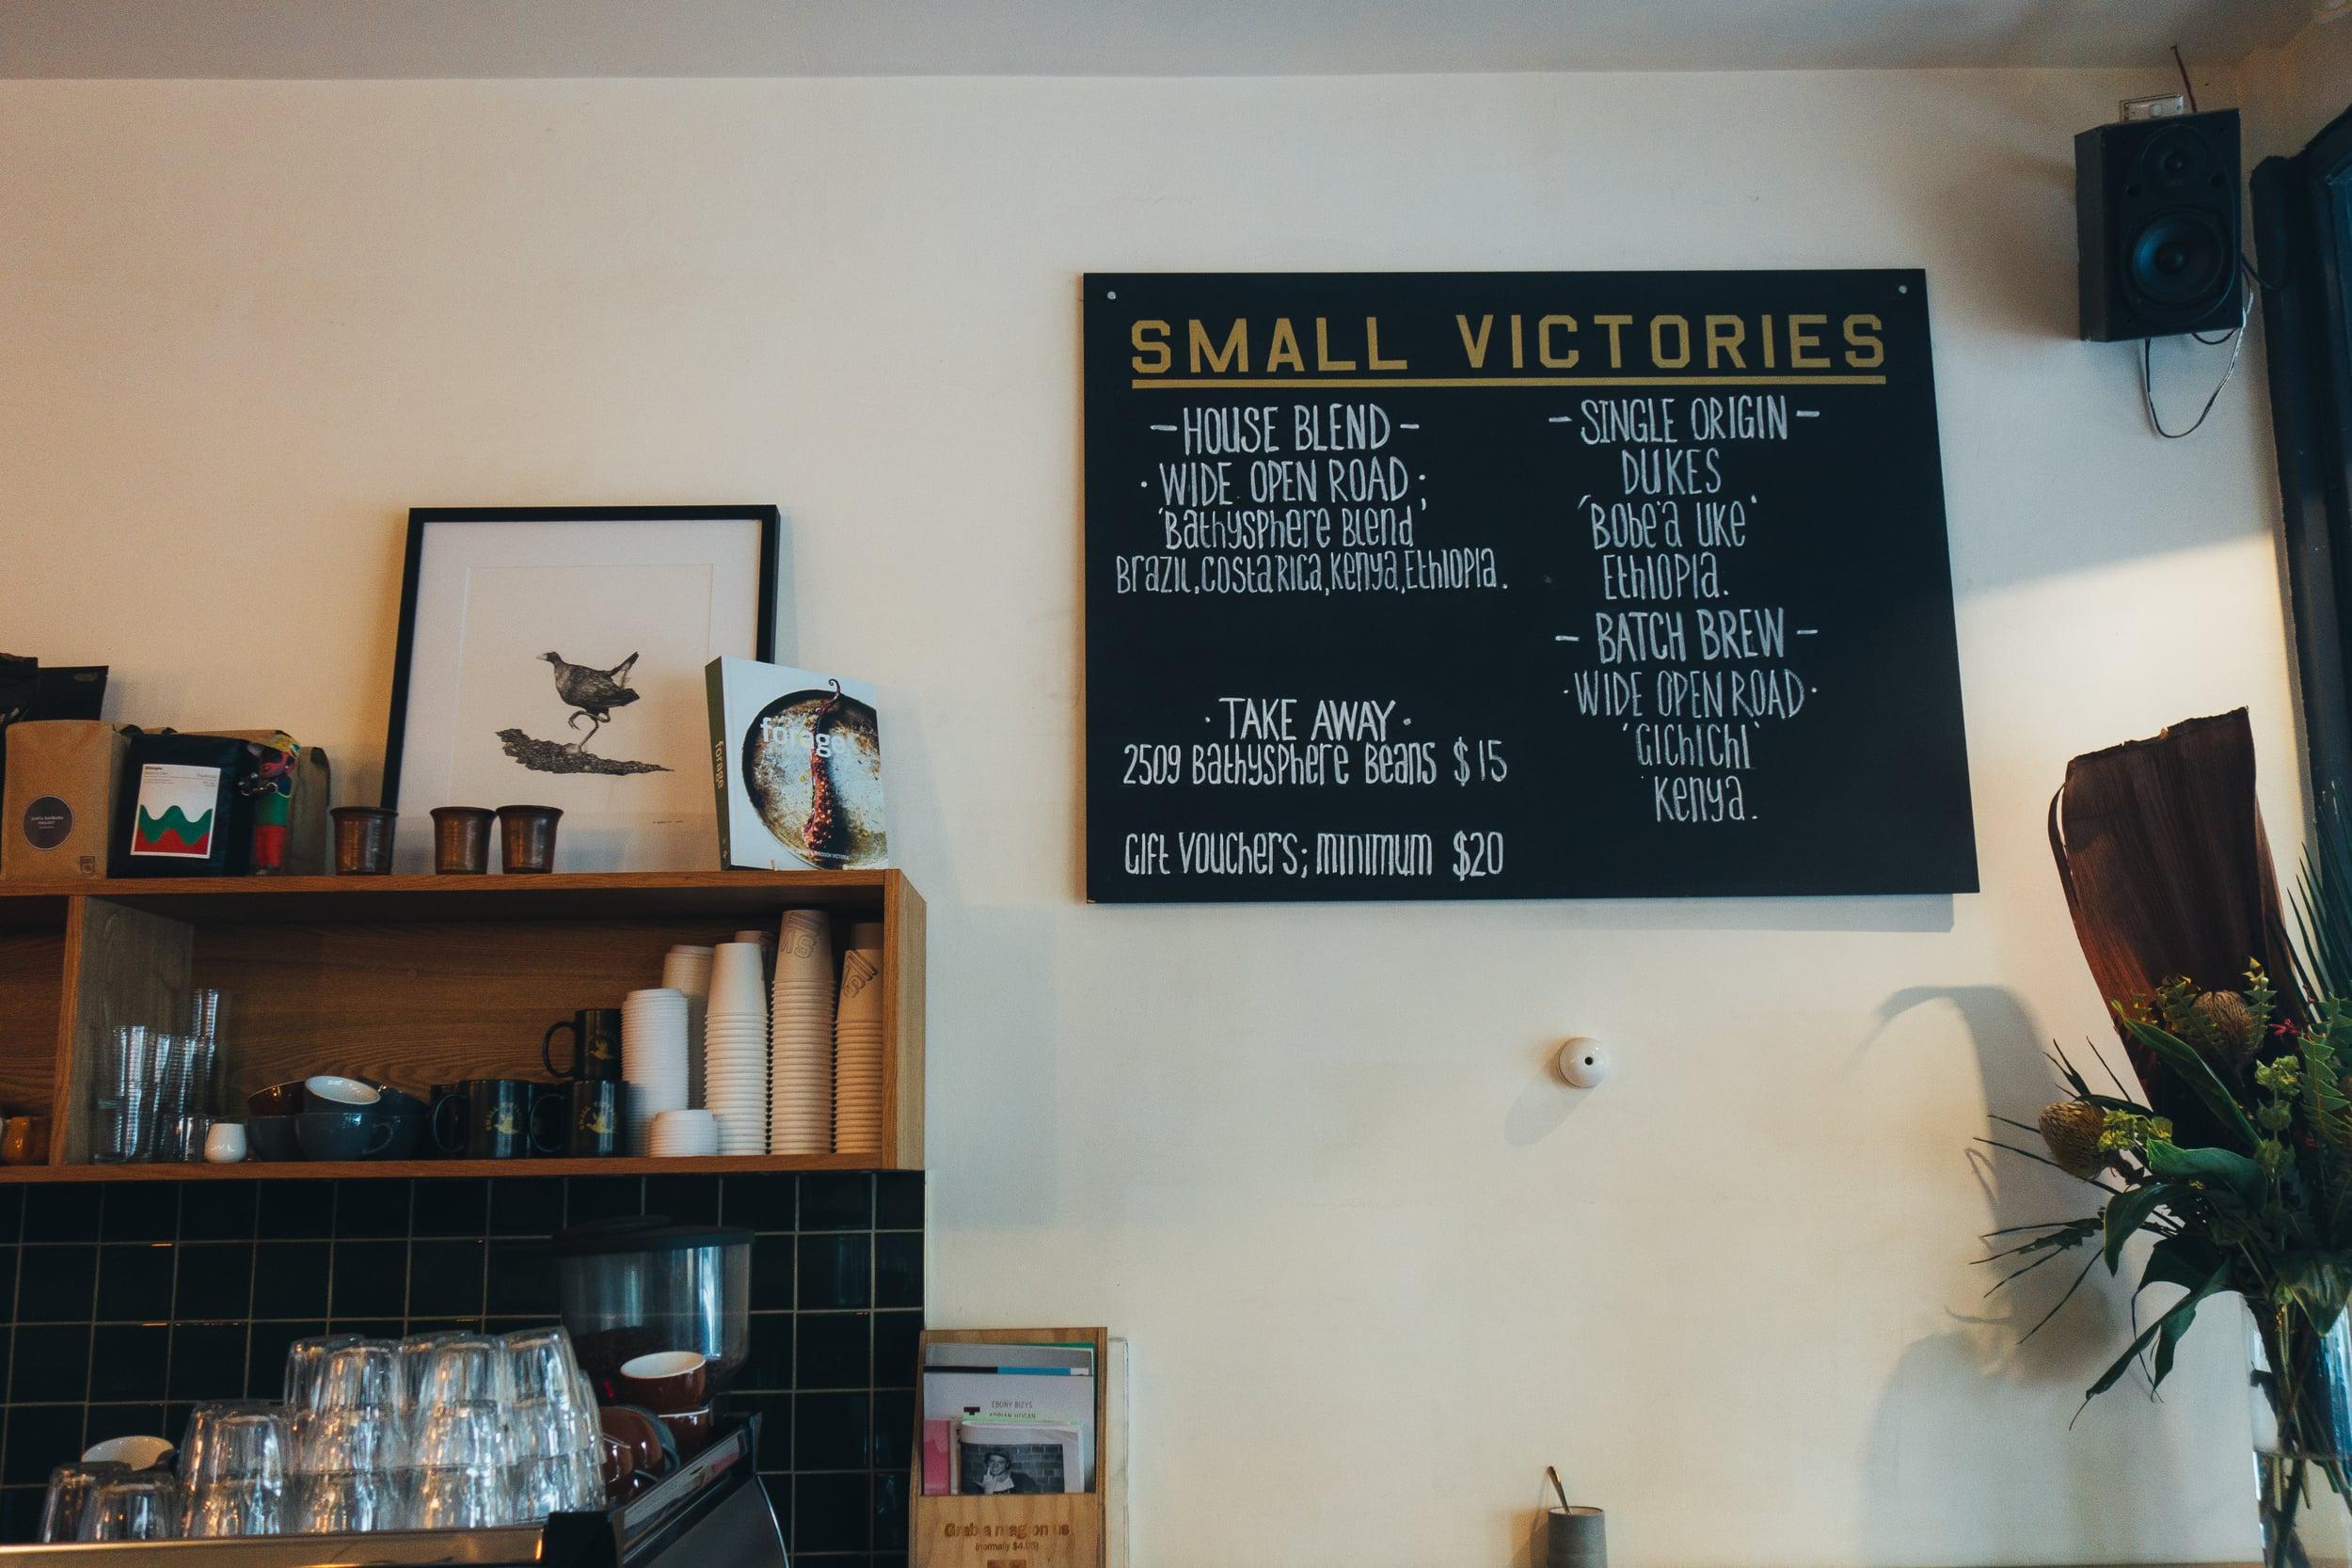 voyage collective small victories interior